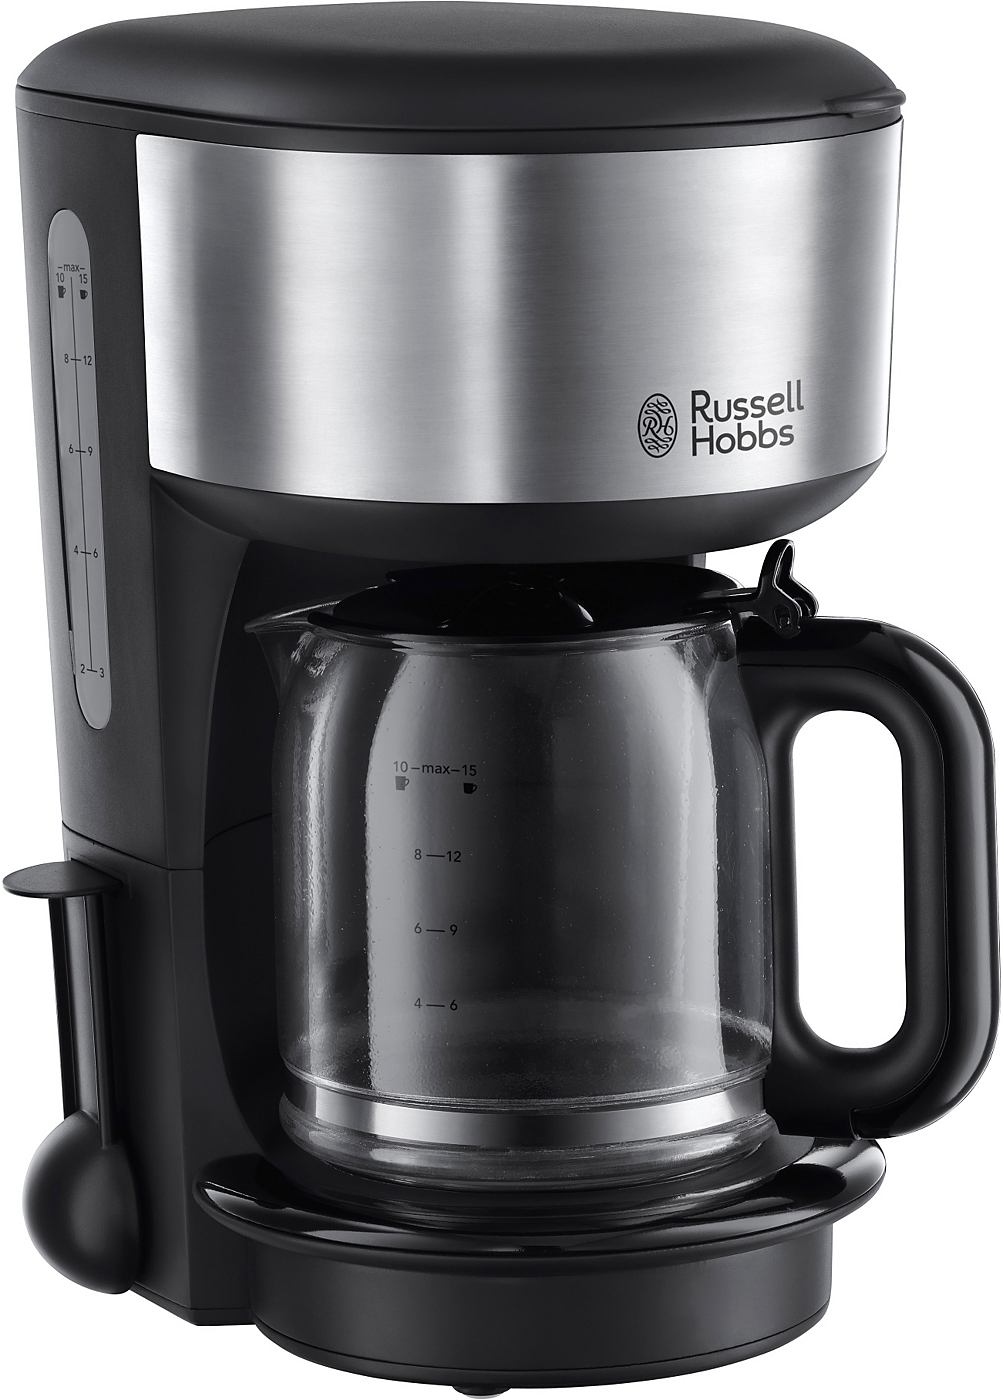 Russell Hobbs Glas-Kaffeemaschine »Oxford« 20130-56